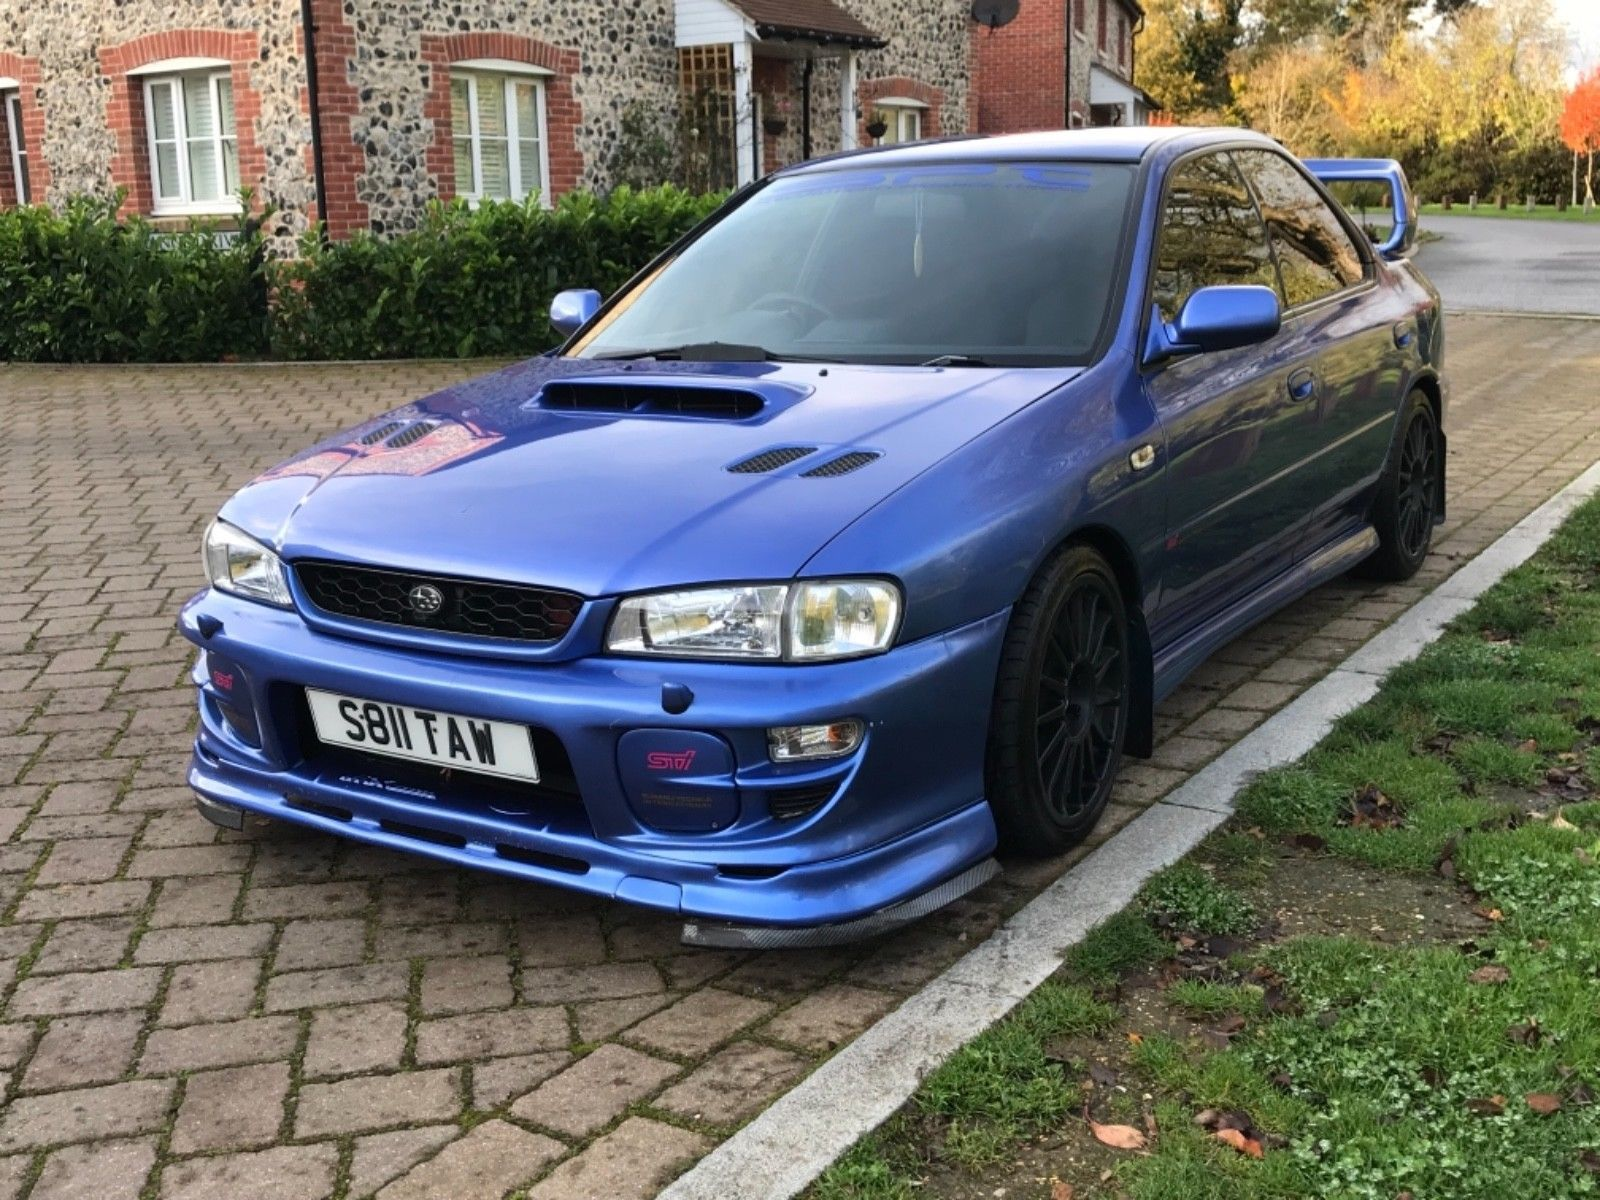 This Subaru Impreza Turbo 2000 250bhp Rare Blue Sti Extra S Modified Track 4wd Is For Sale Subaru Impreza Subaru Impreza